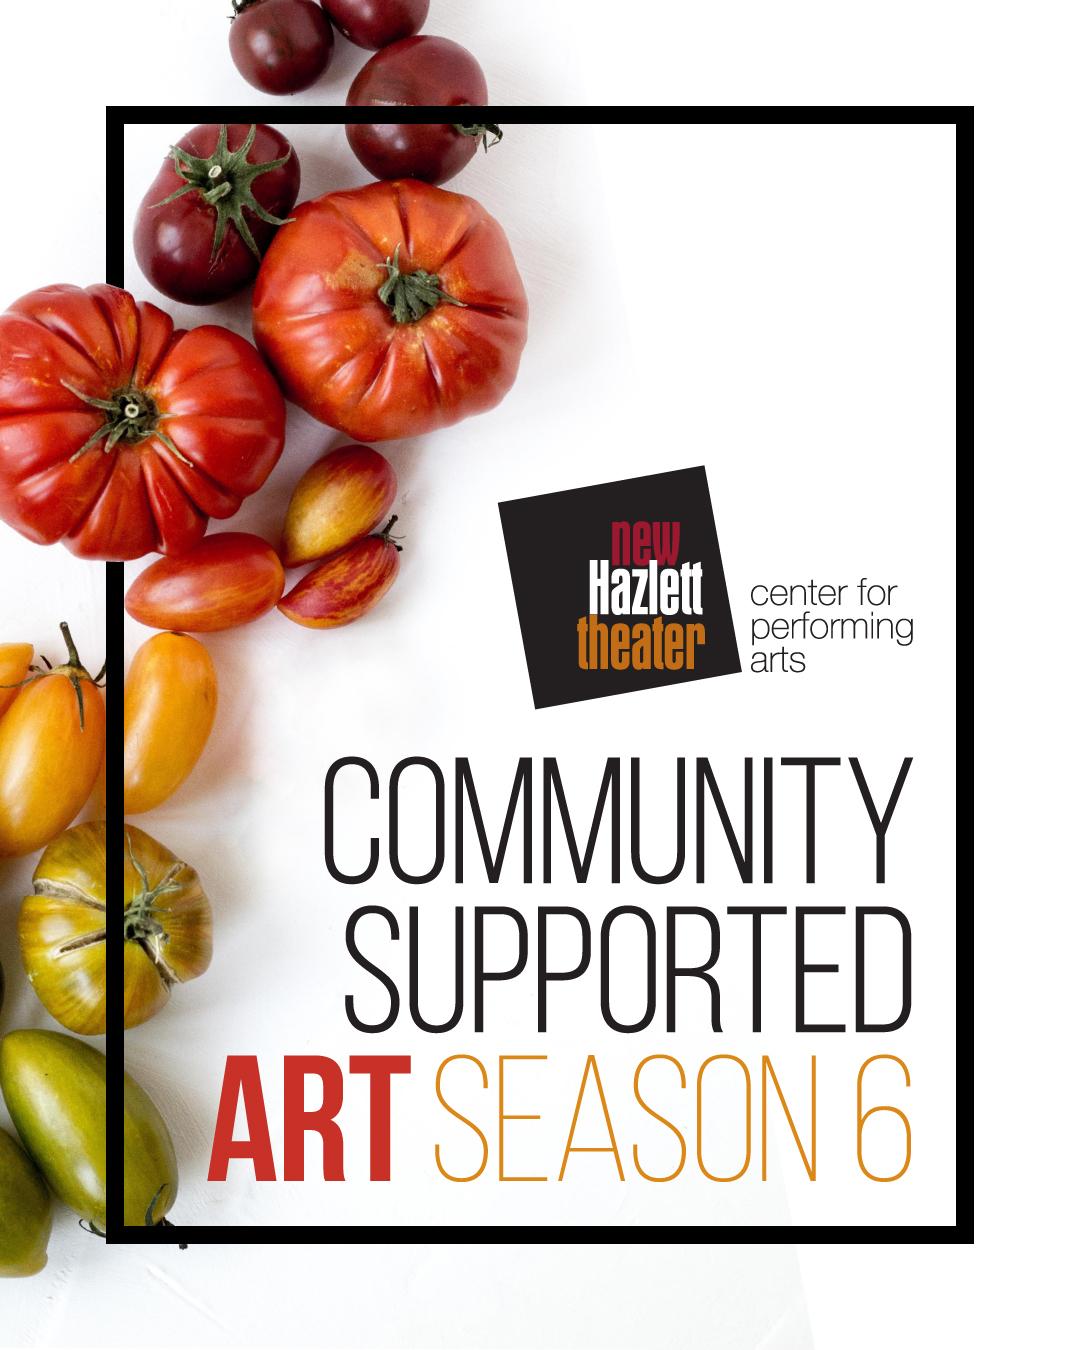 New Hazlett Theater Presents Community Supported Art